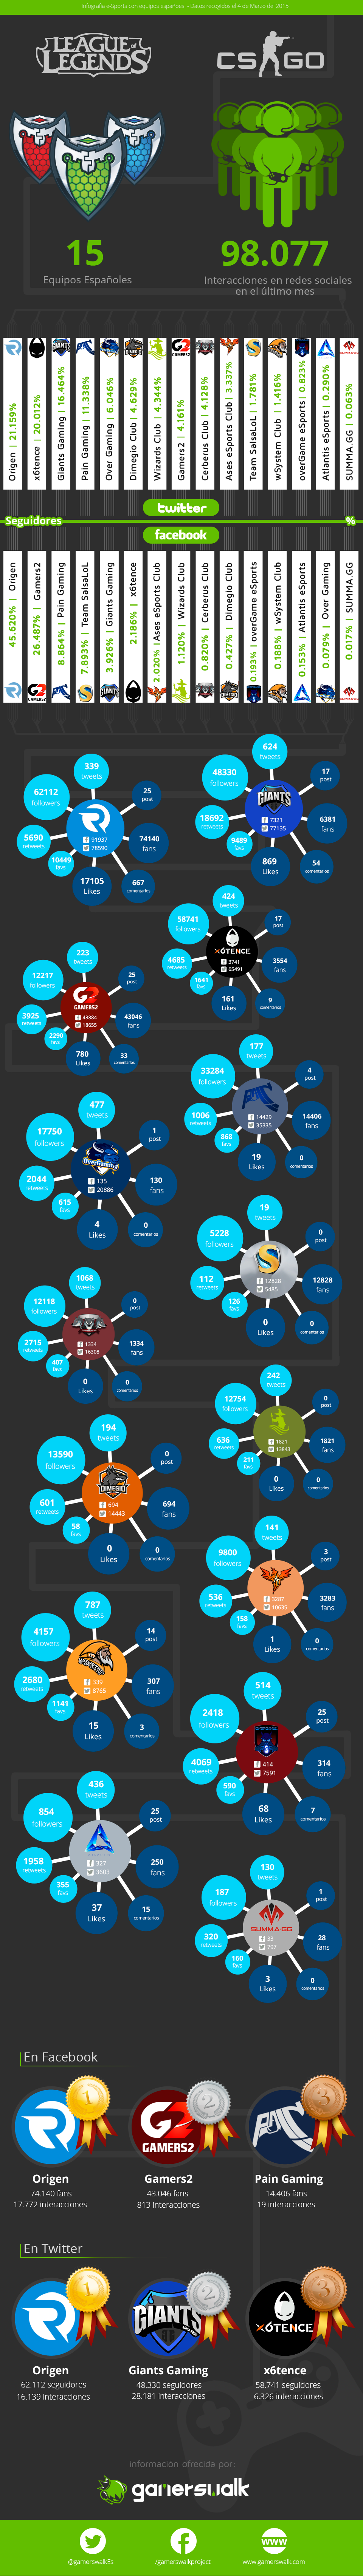 Infografia (optimizada)